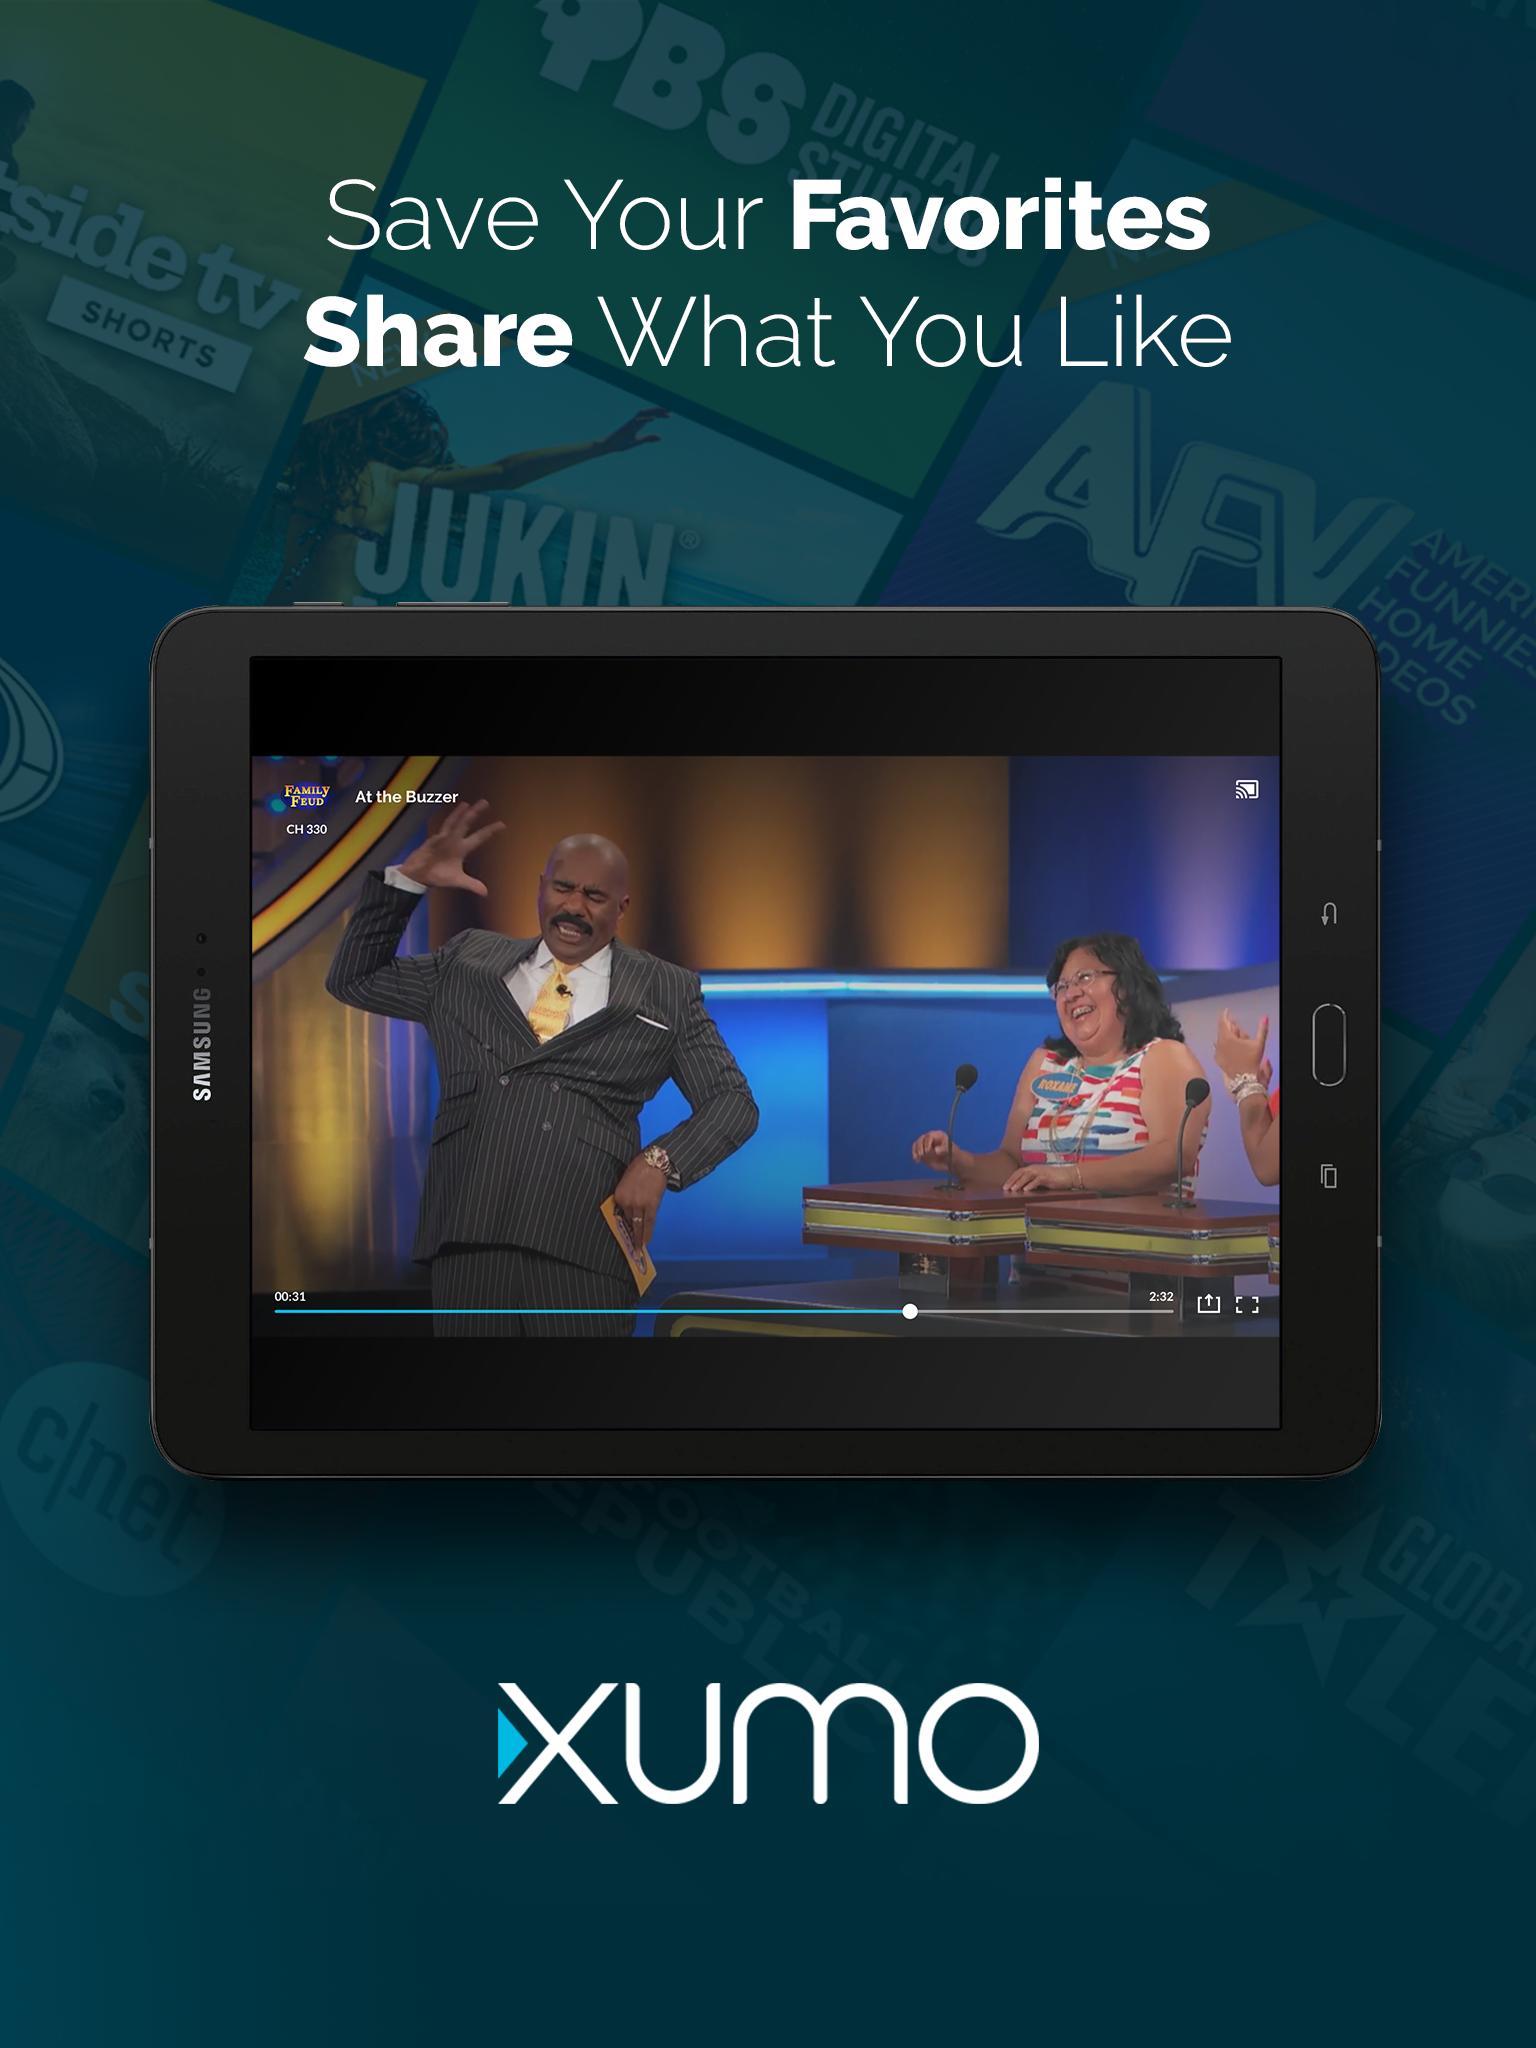 XUMO Free Streaming TV Shows and Movies 2.7.75 Screenshot 13